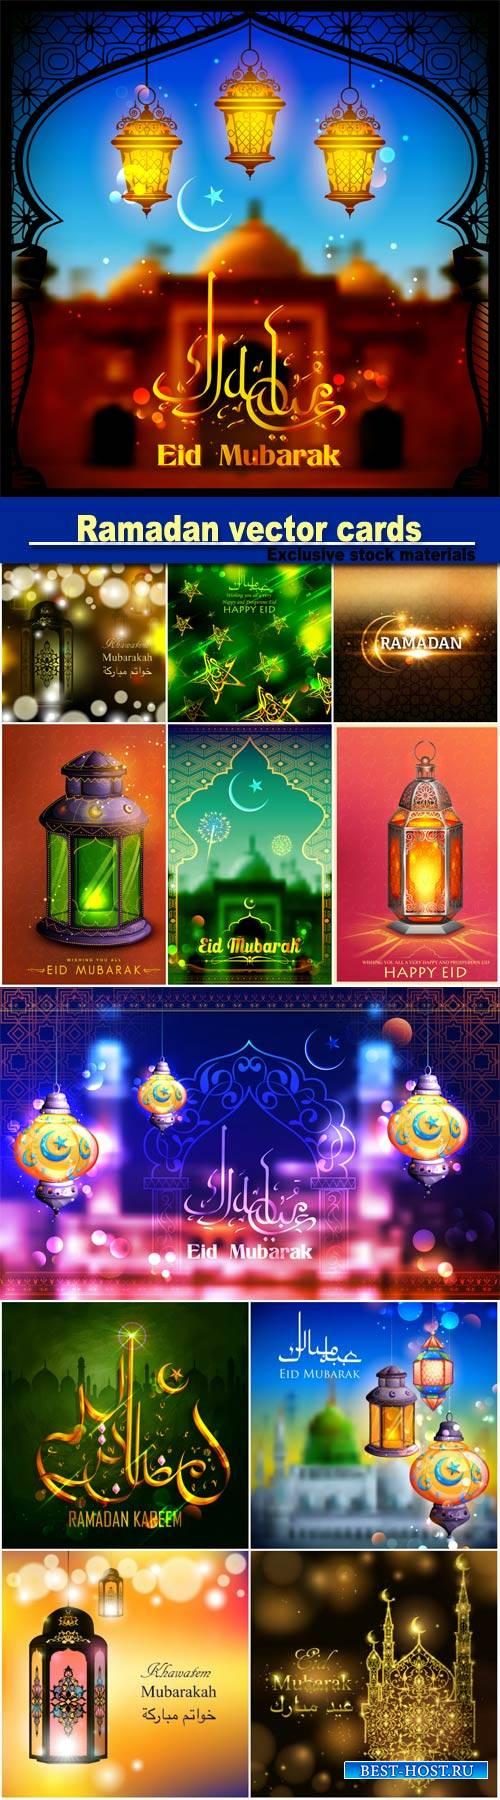 Ramadan vector cards